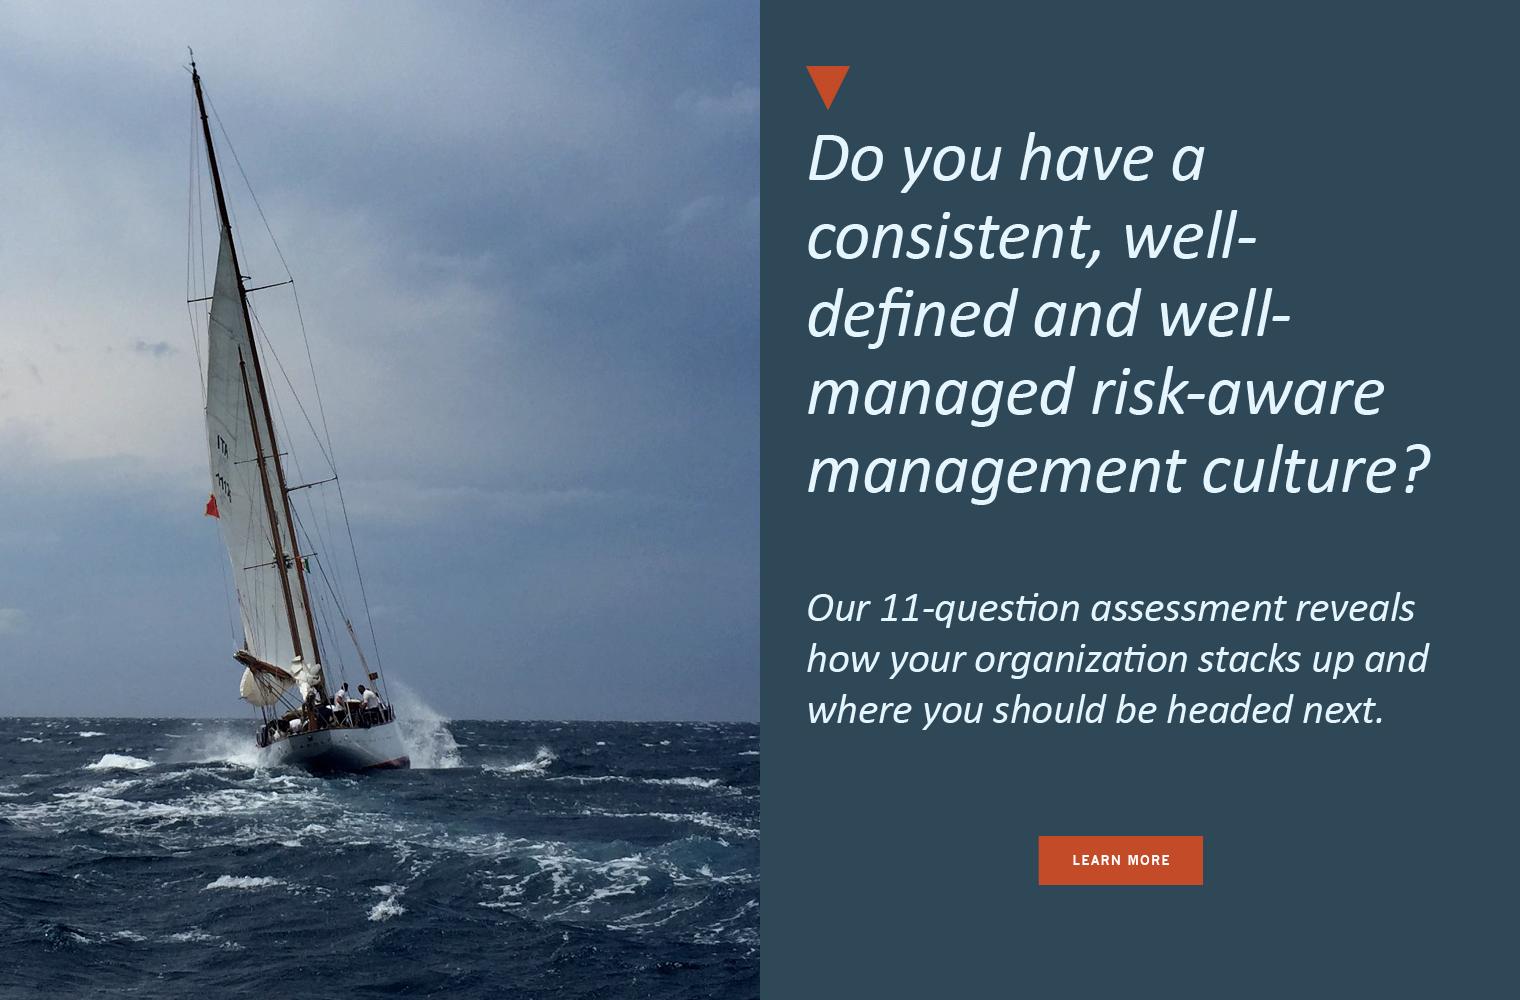 SPIN_Risk_Compliance_Web_Assessment_FINAL-2